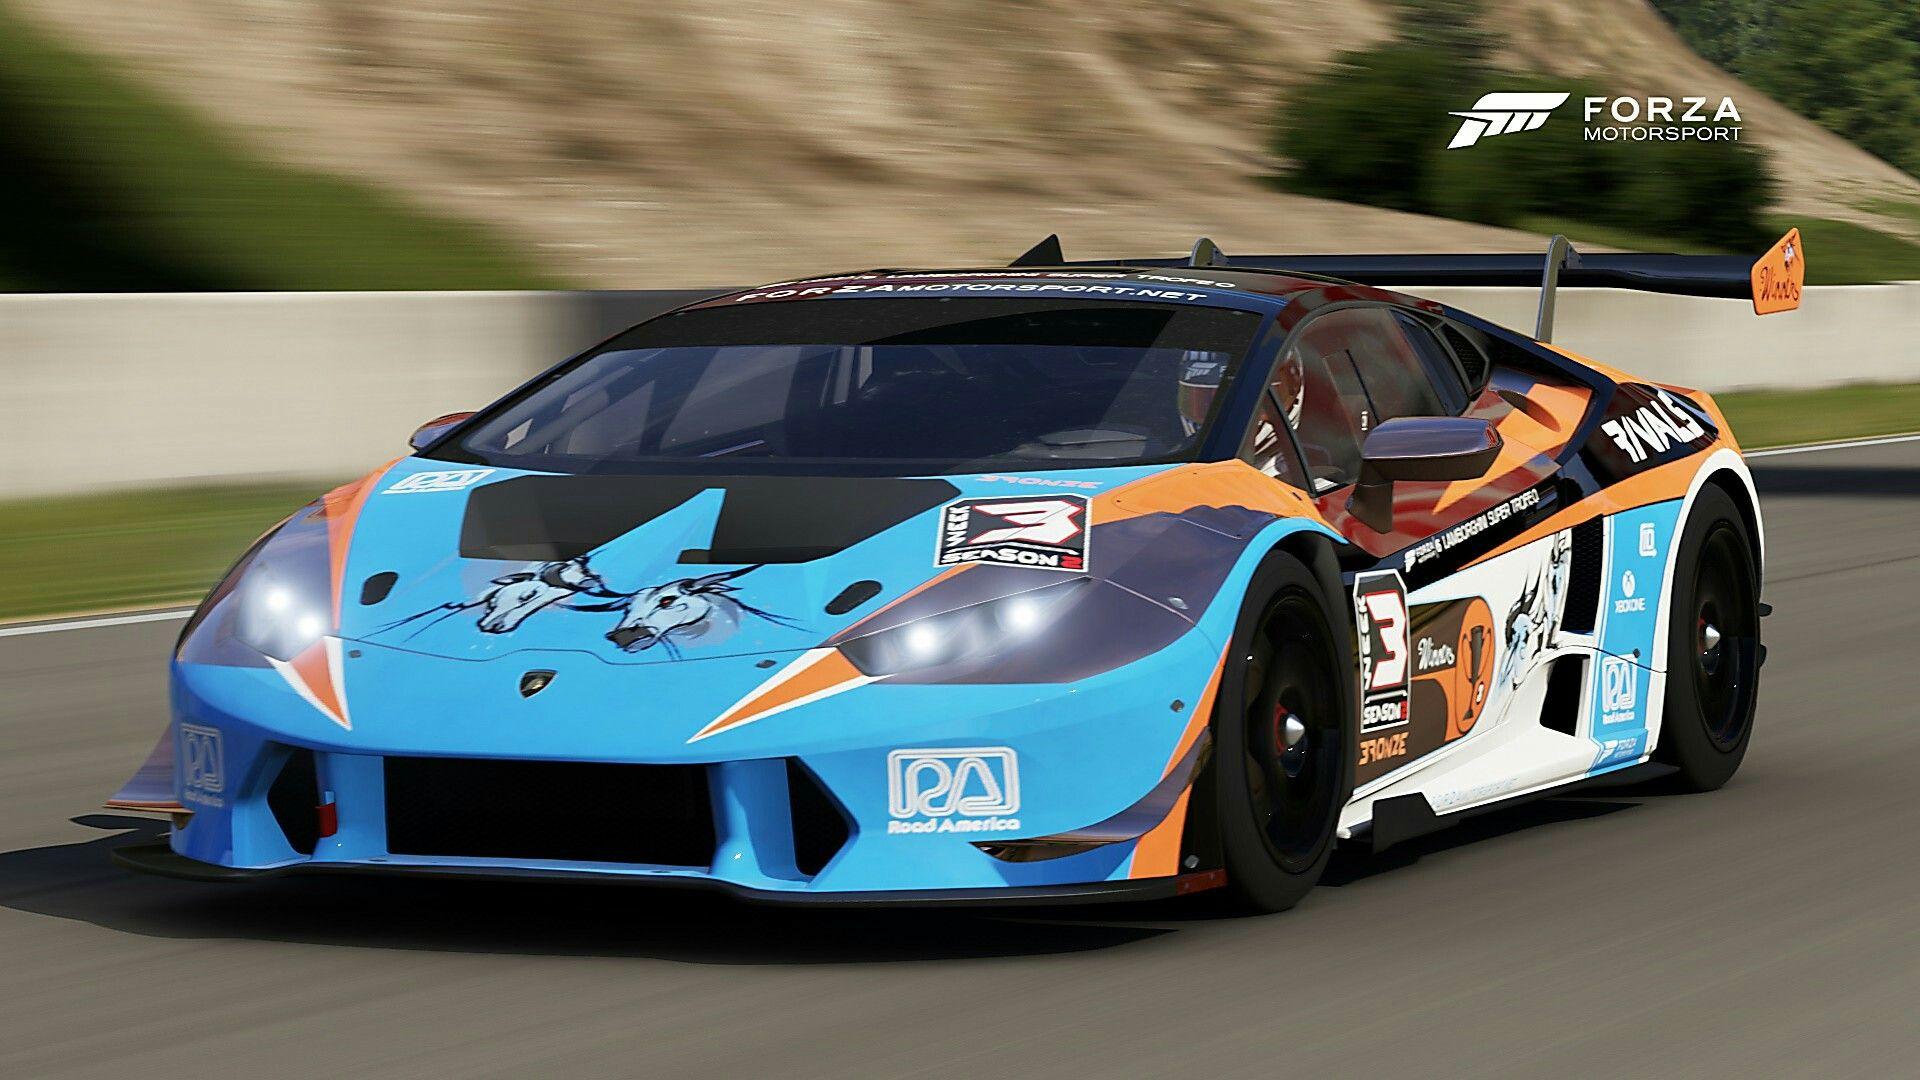 bcbc85513652481485e27add96cf9b18 Gorgeous Lamborghini Huracan Lp620-2 Super Trofeo top Speed Cars Trend